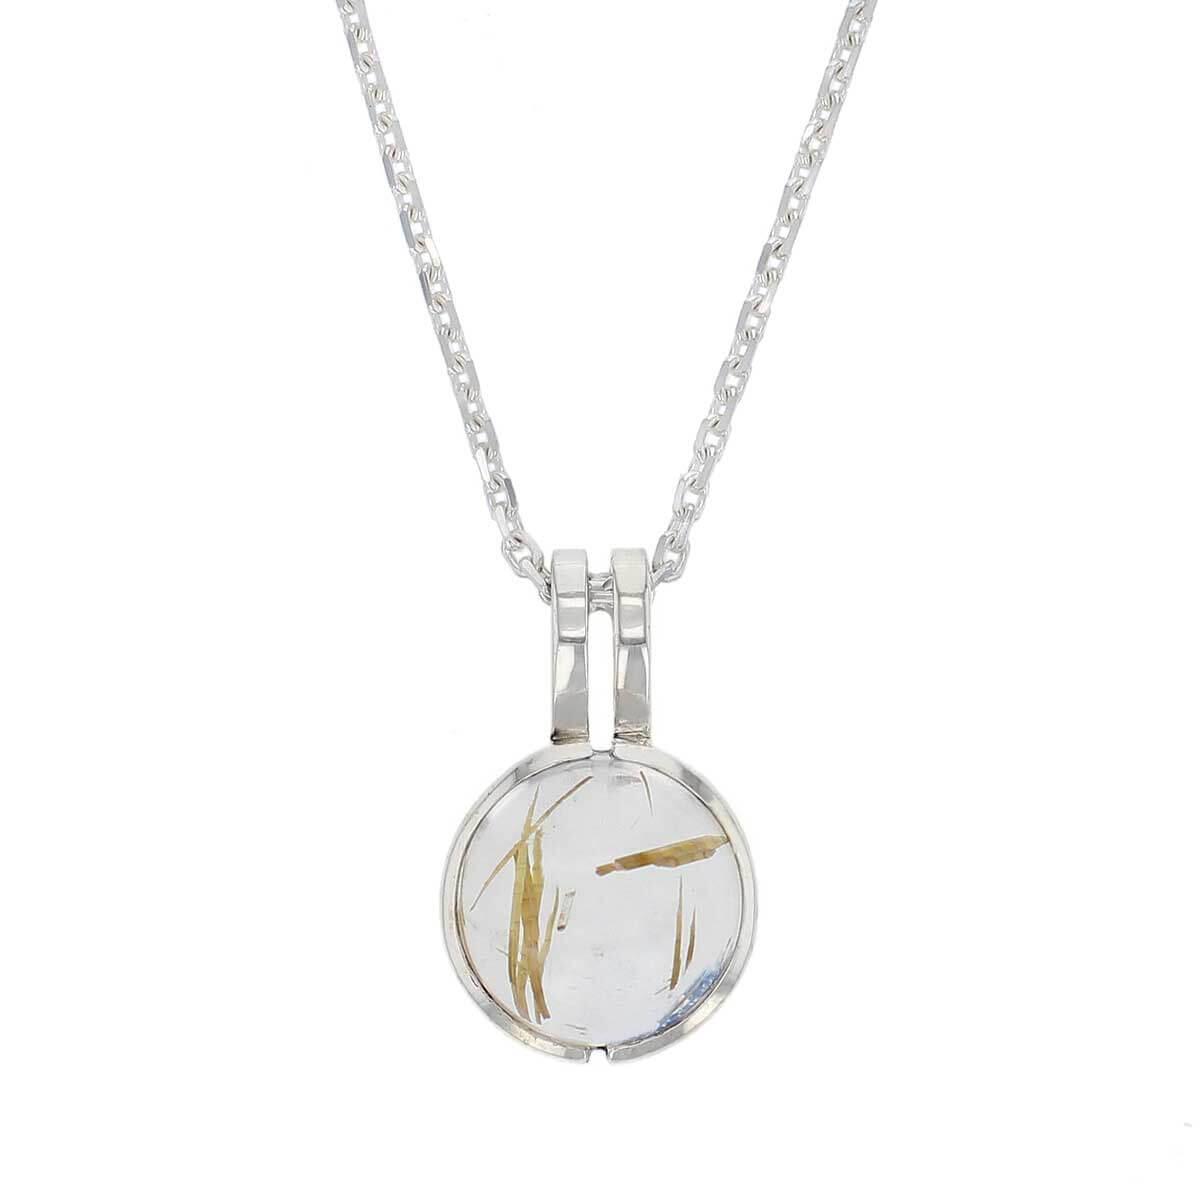 sterling silver round cut cabochon golden rutile quartz gemstone dress pendant, designer jewellery, yellow rutilated quartz gem, jewelry, handmade by Faller, Londonderry, Northern Ireland, Irish hand crafted, darcy, D'arcy